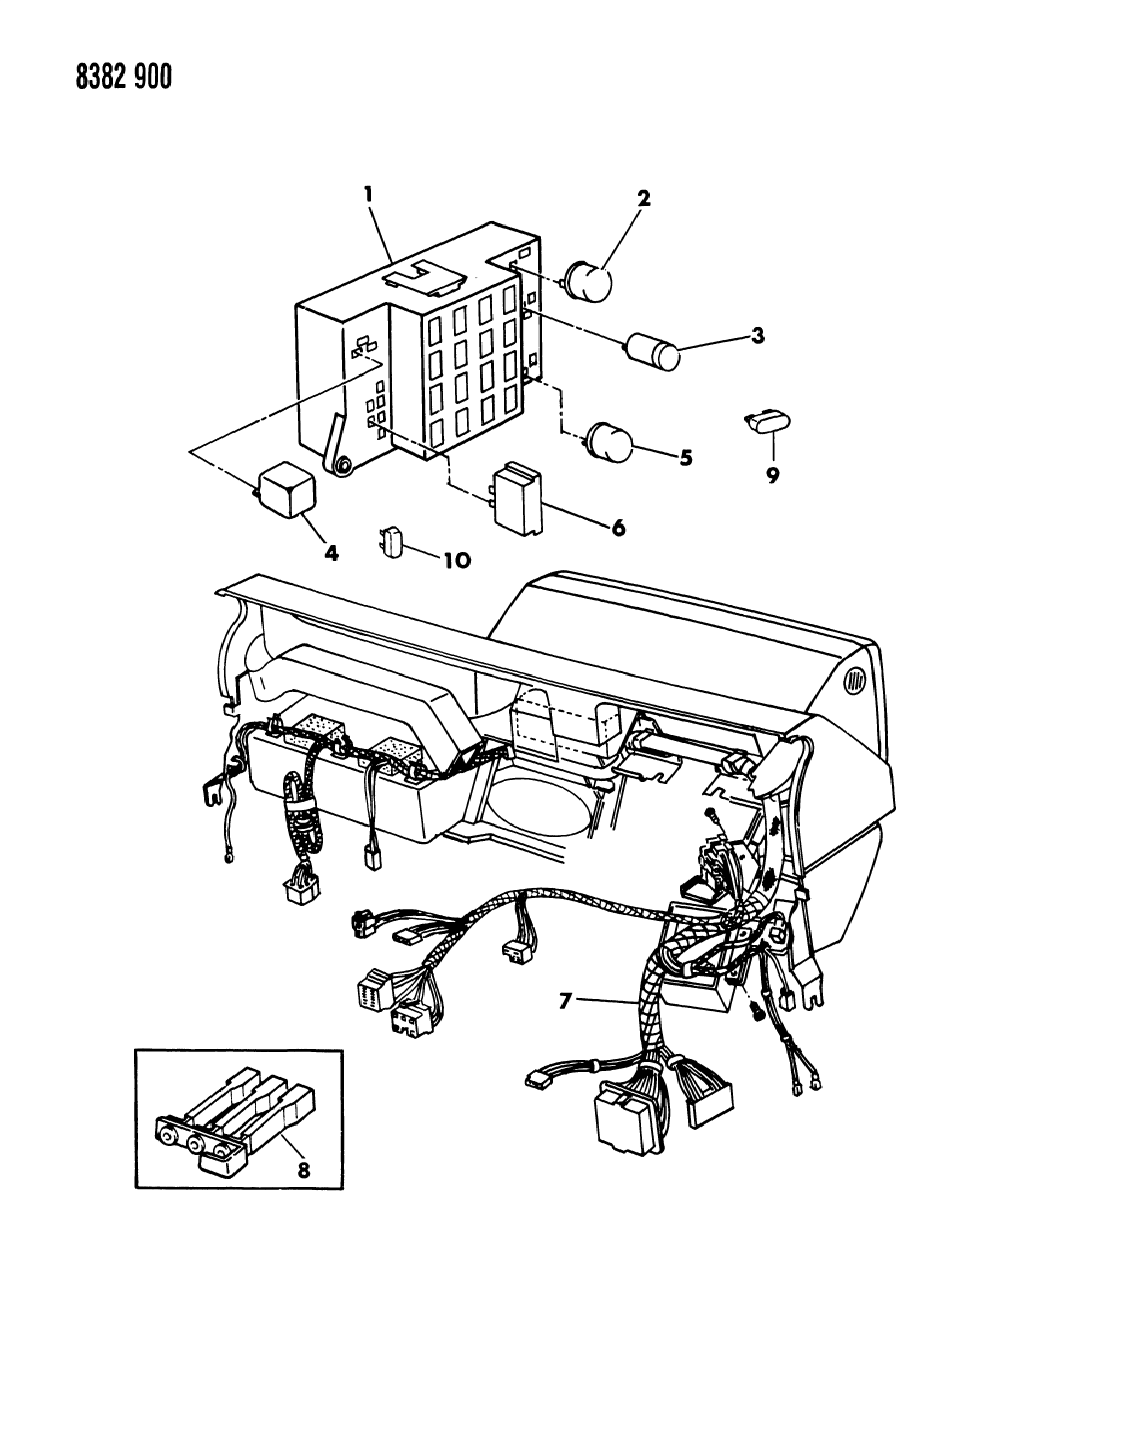 1987 dodge ram wiring diagram